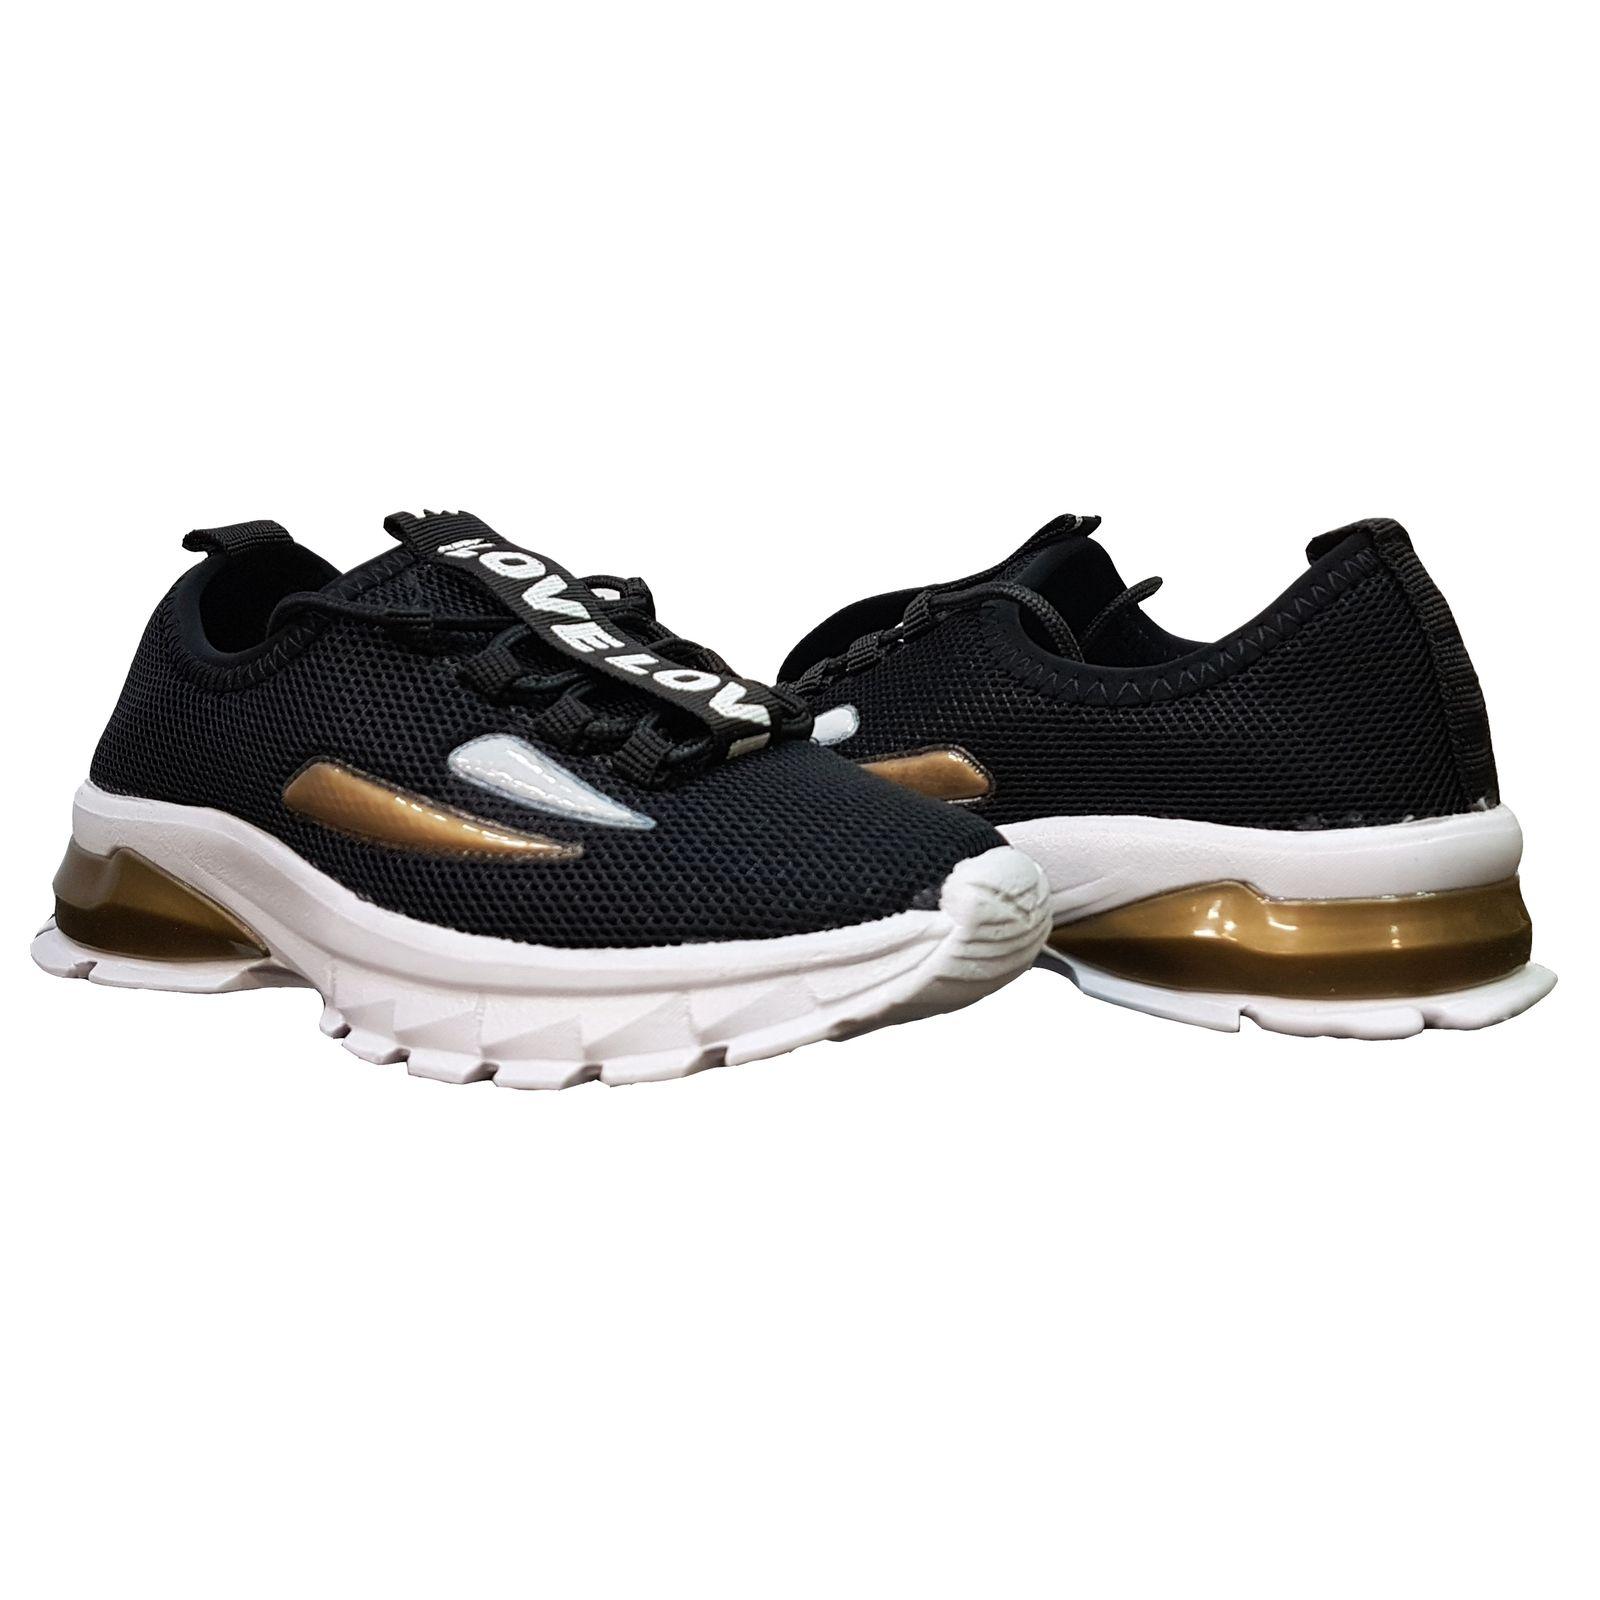 کفش پیاده روی پسرانه کد 3328129 -  - 6